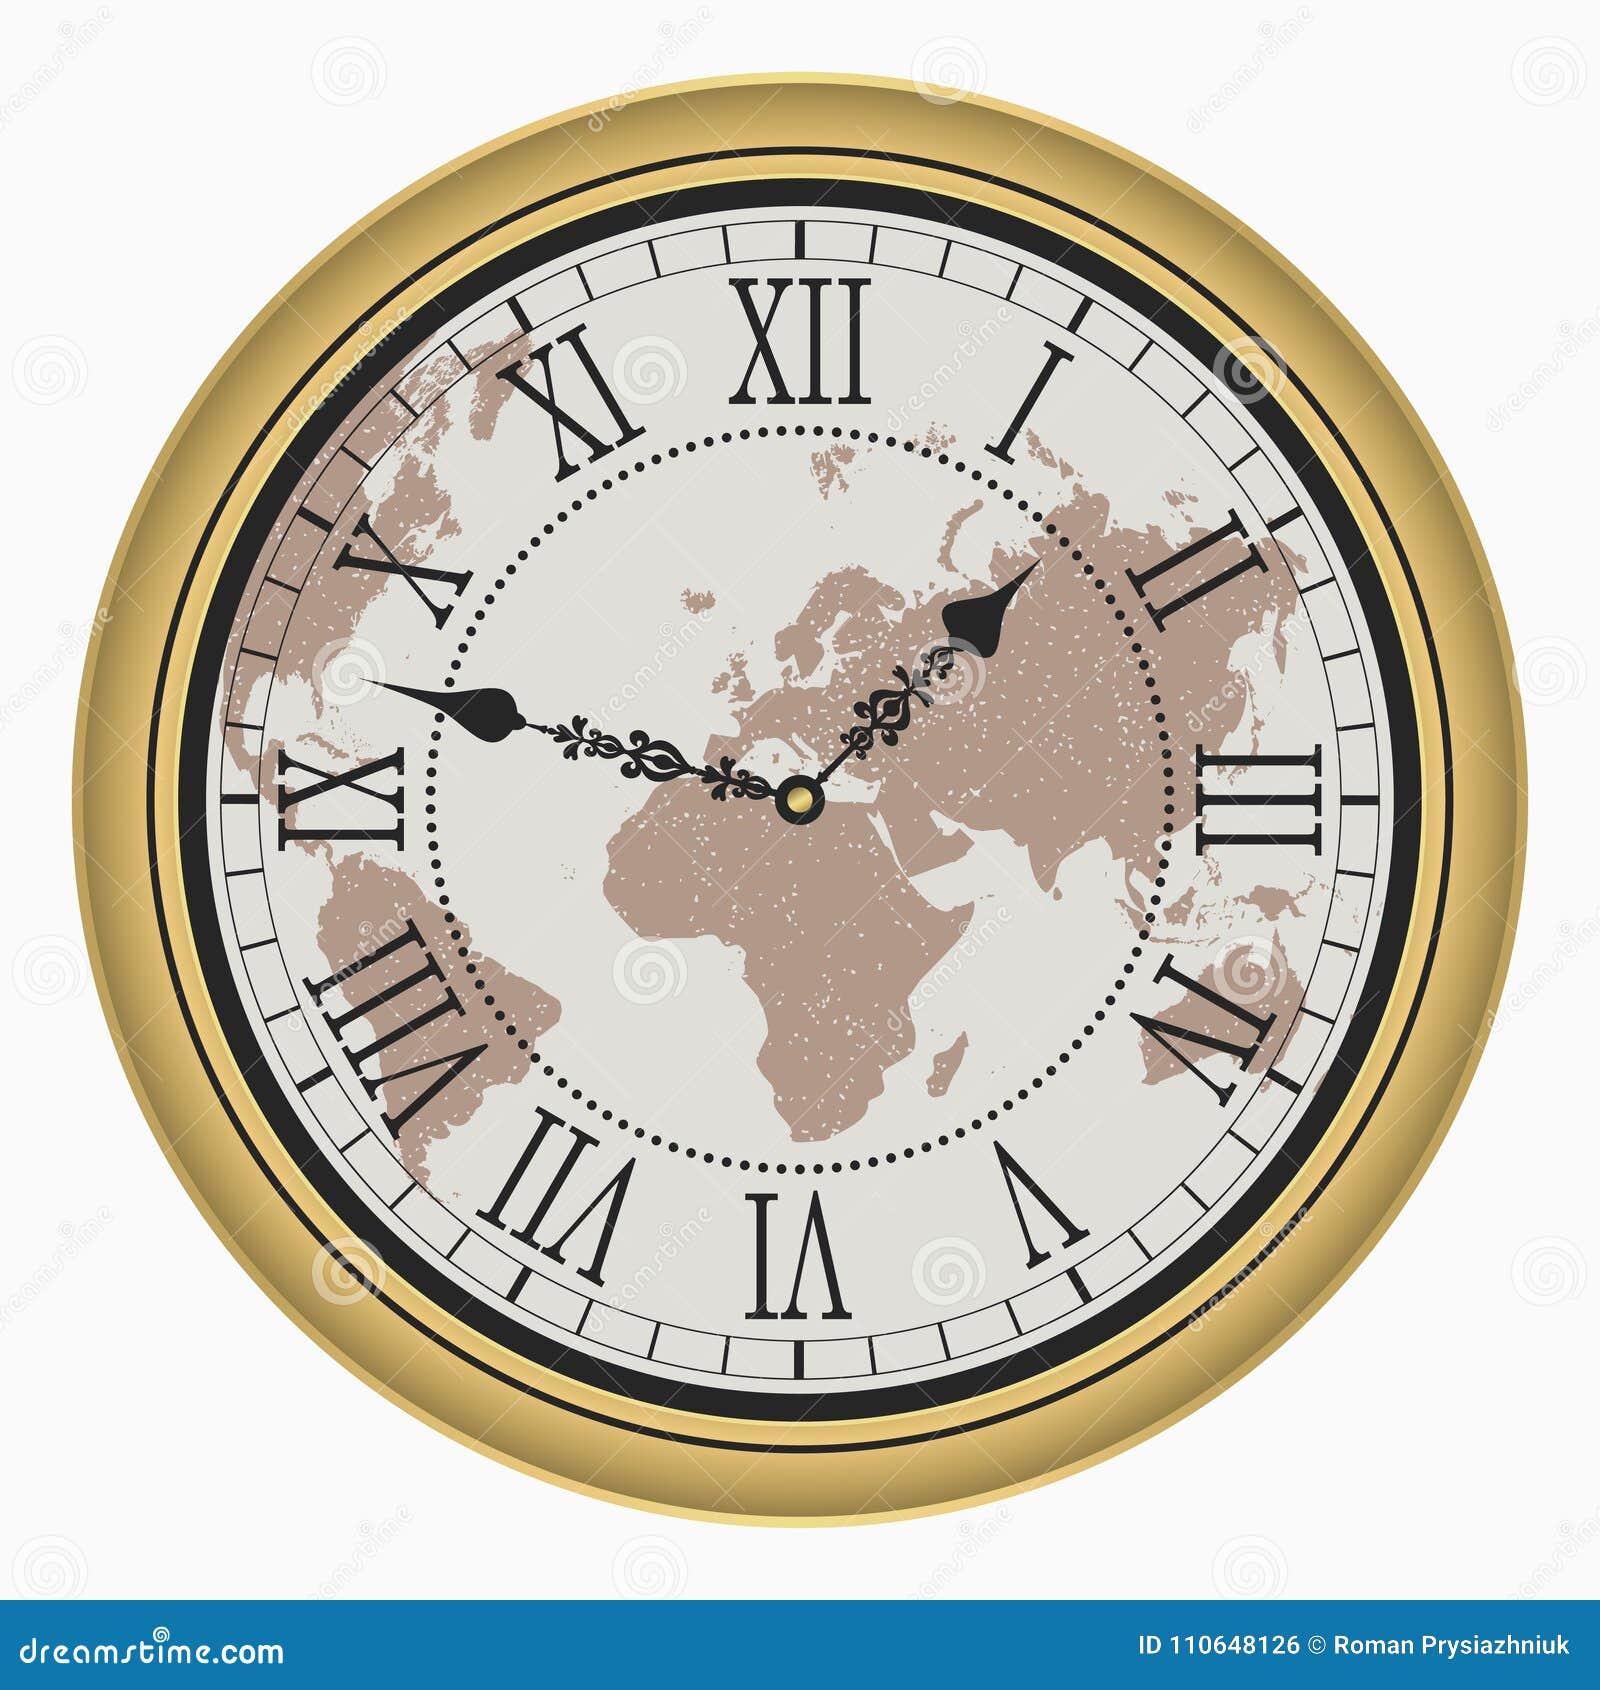 Vintage clock with world map antique golden wall clock face dial download vintage clock with world map antique golden wall clock face dial with roman gumiabroncs Images